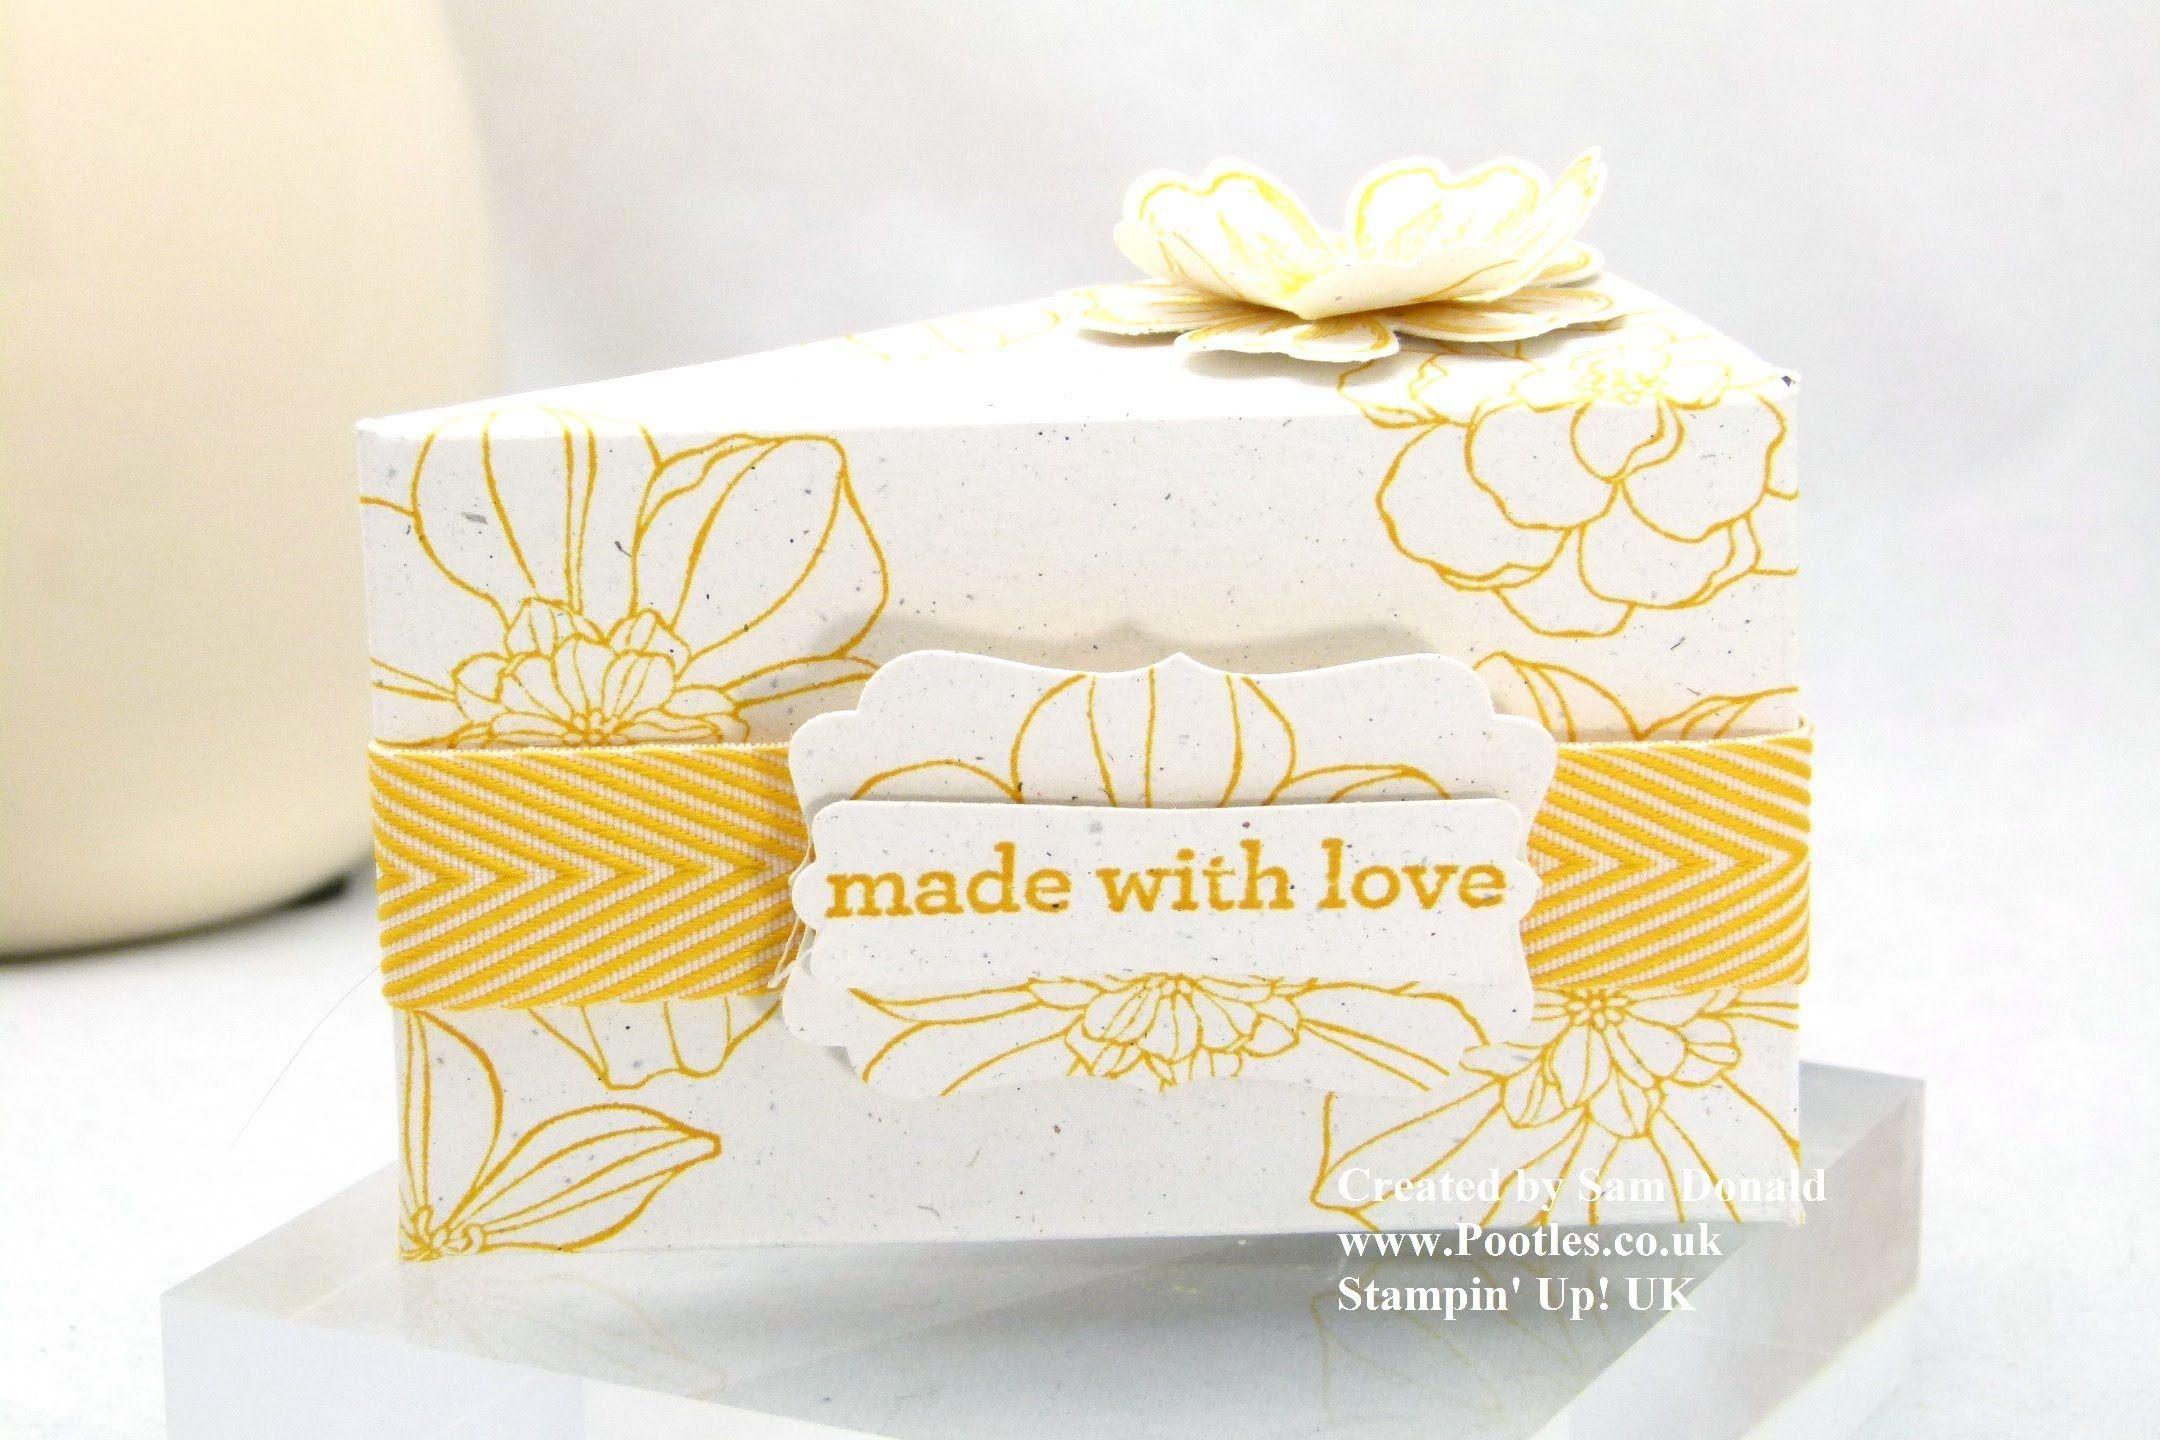 Stampin Up Uk Cake Slice Box Imperial Tutorial Gift Box Punch Board Cake Slice Boxes Stampin Up